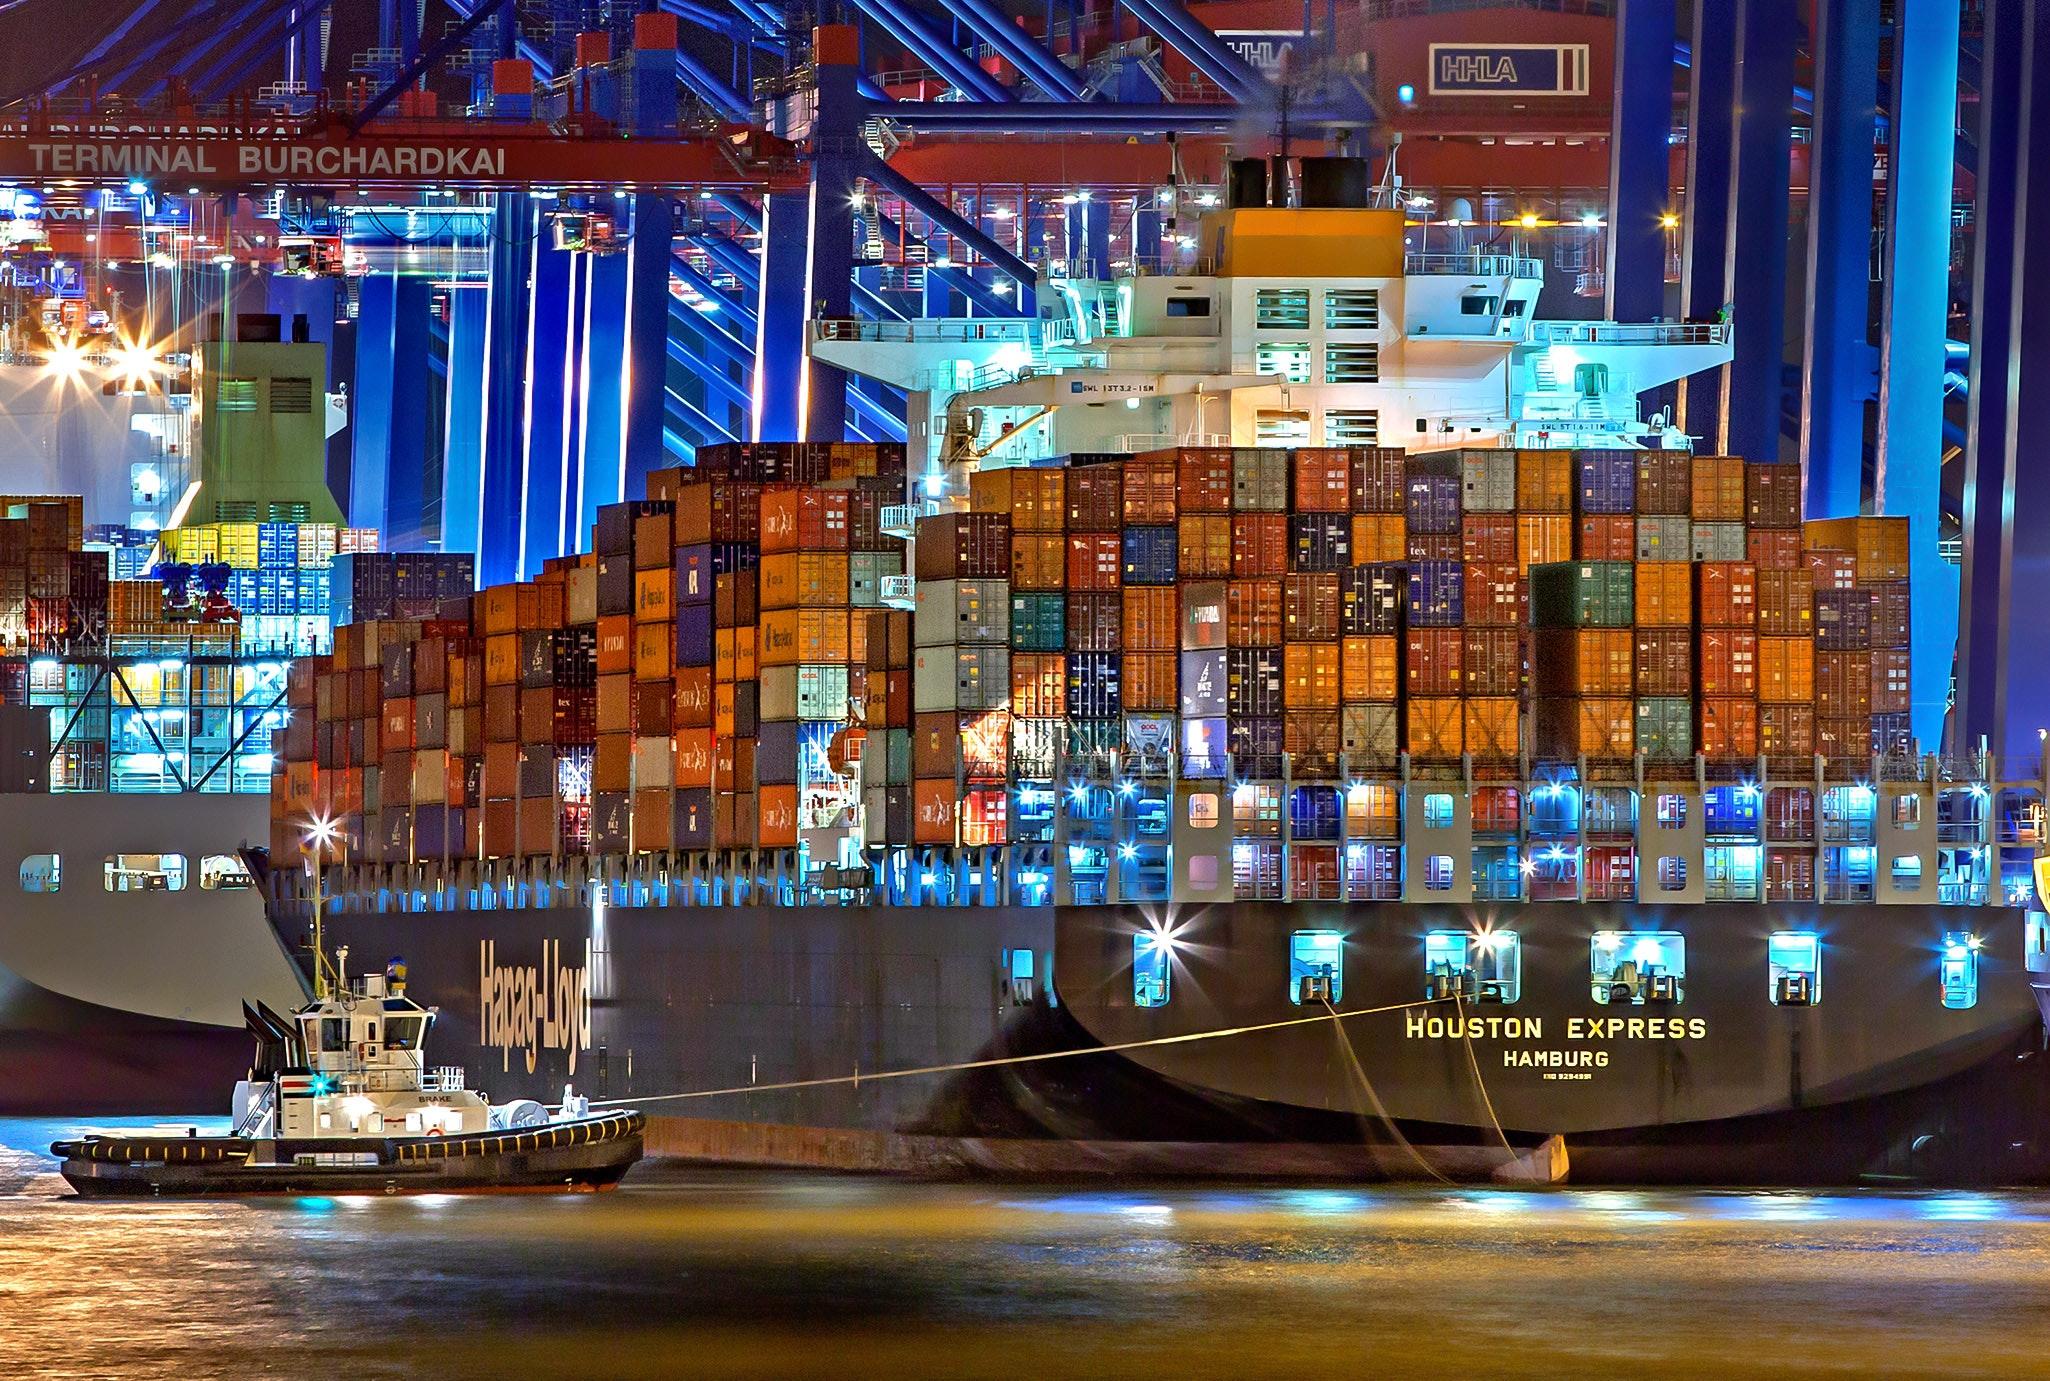 Cross border trade made simple